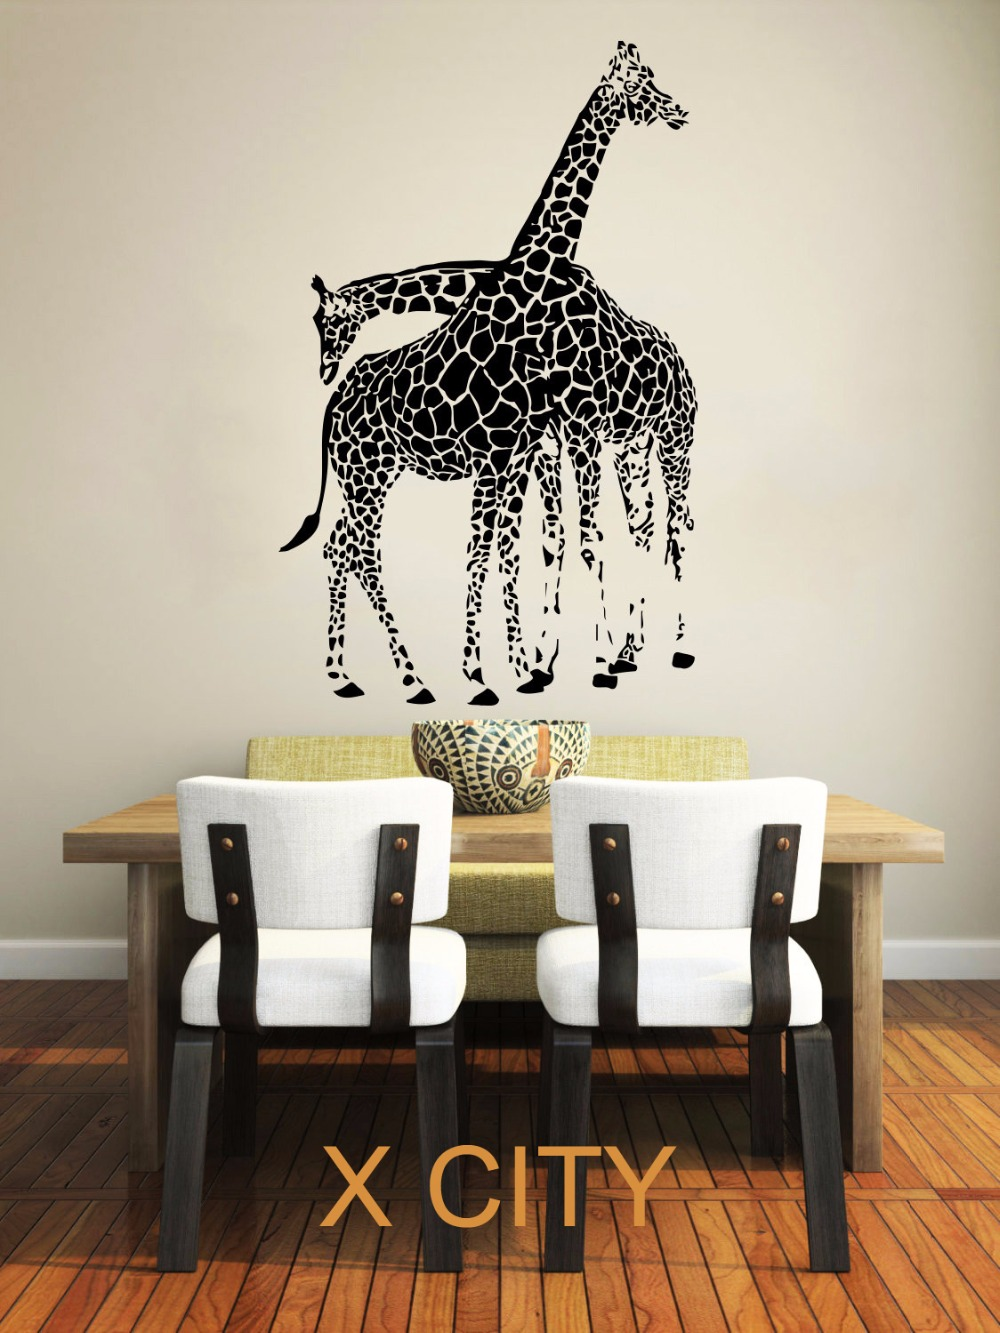 online get cheap safari wall mural aliexpress com alibaba group giraffe animals jungle safari african childrens decor kids vinyl sticker wall decal nursery bedroom murals playroom